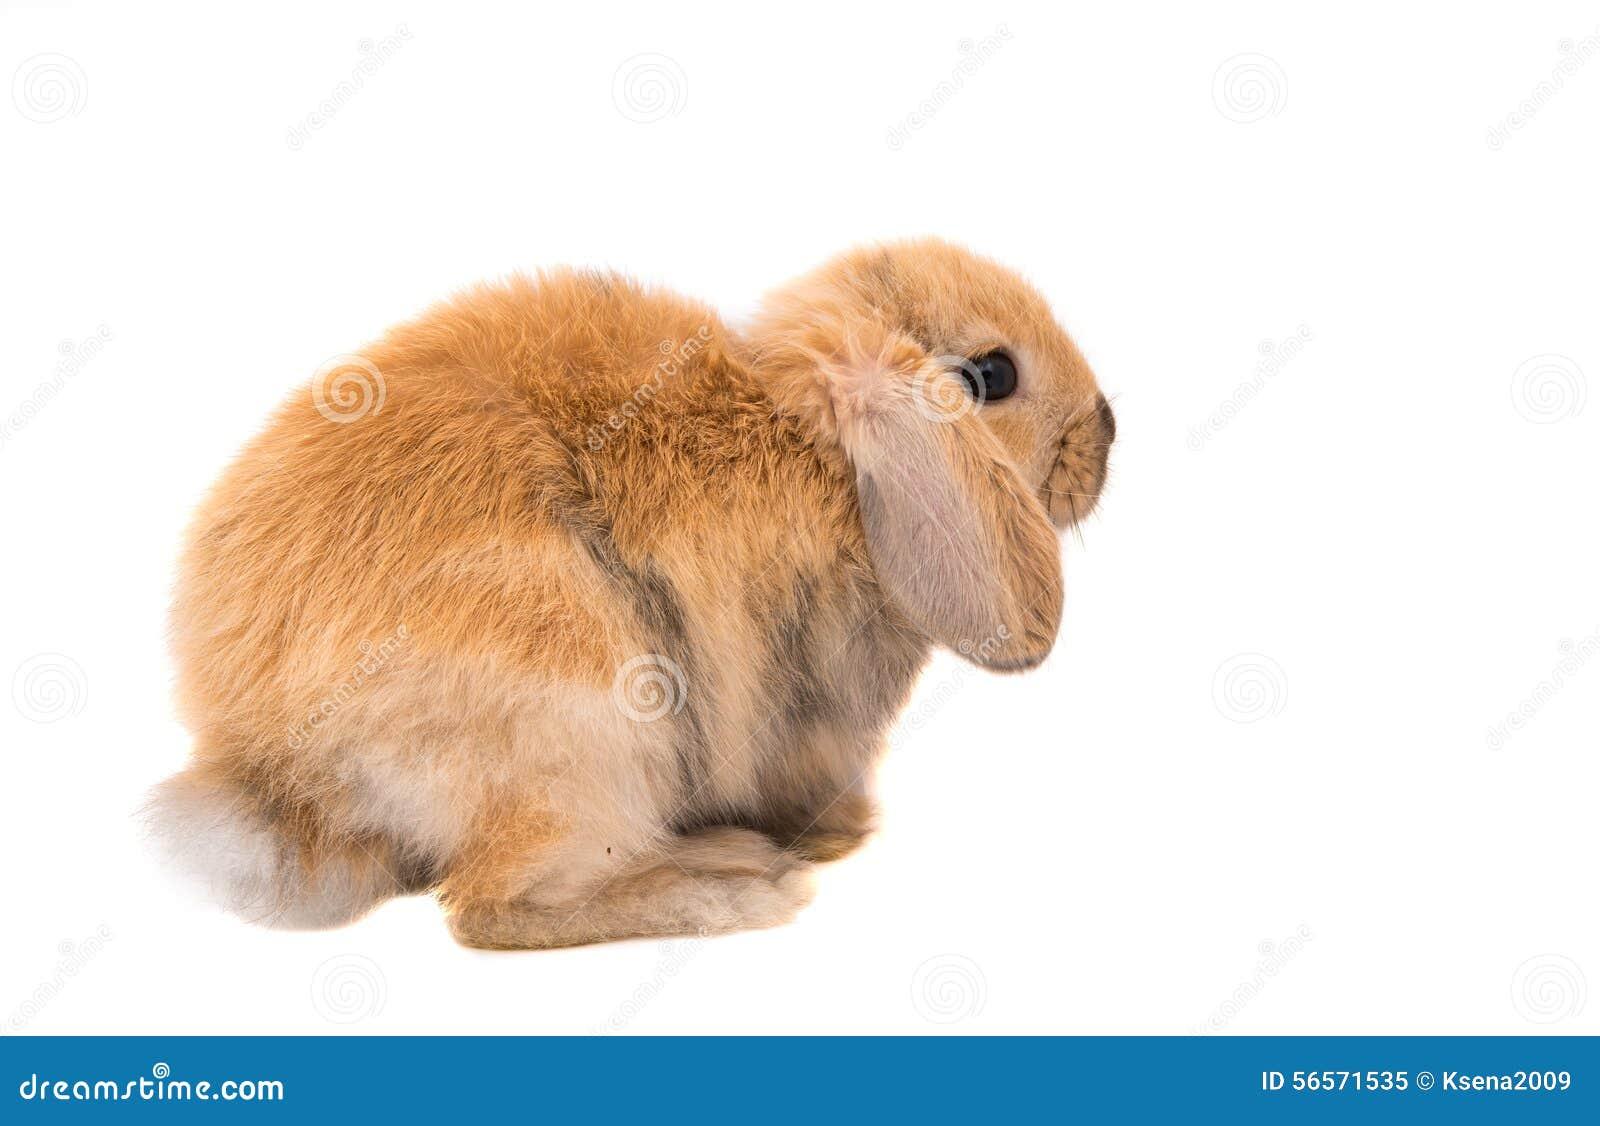 Download Φυλή κριού κουνελιών, κόκκινο χρώμα Στοκ Εικόνα - εικόνα από αυτιά, αντίγραφο: 56571535